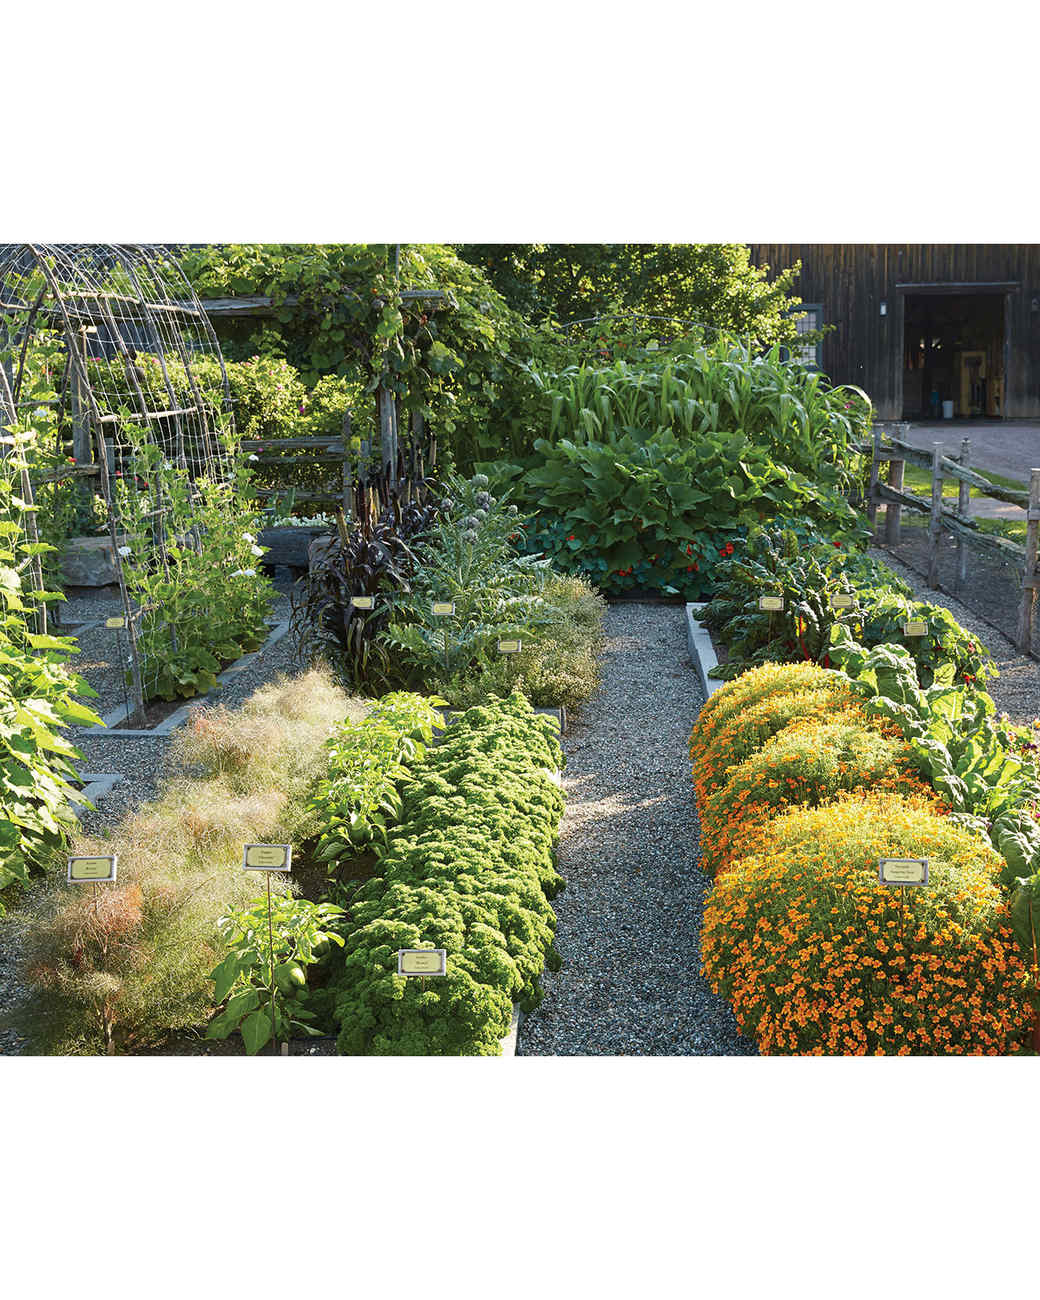 rockefeller-kitchen-garden-detail-484-d112371.jpg